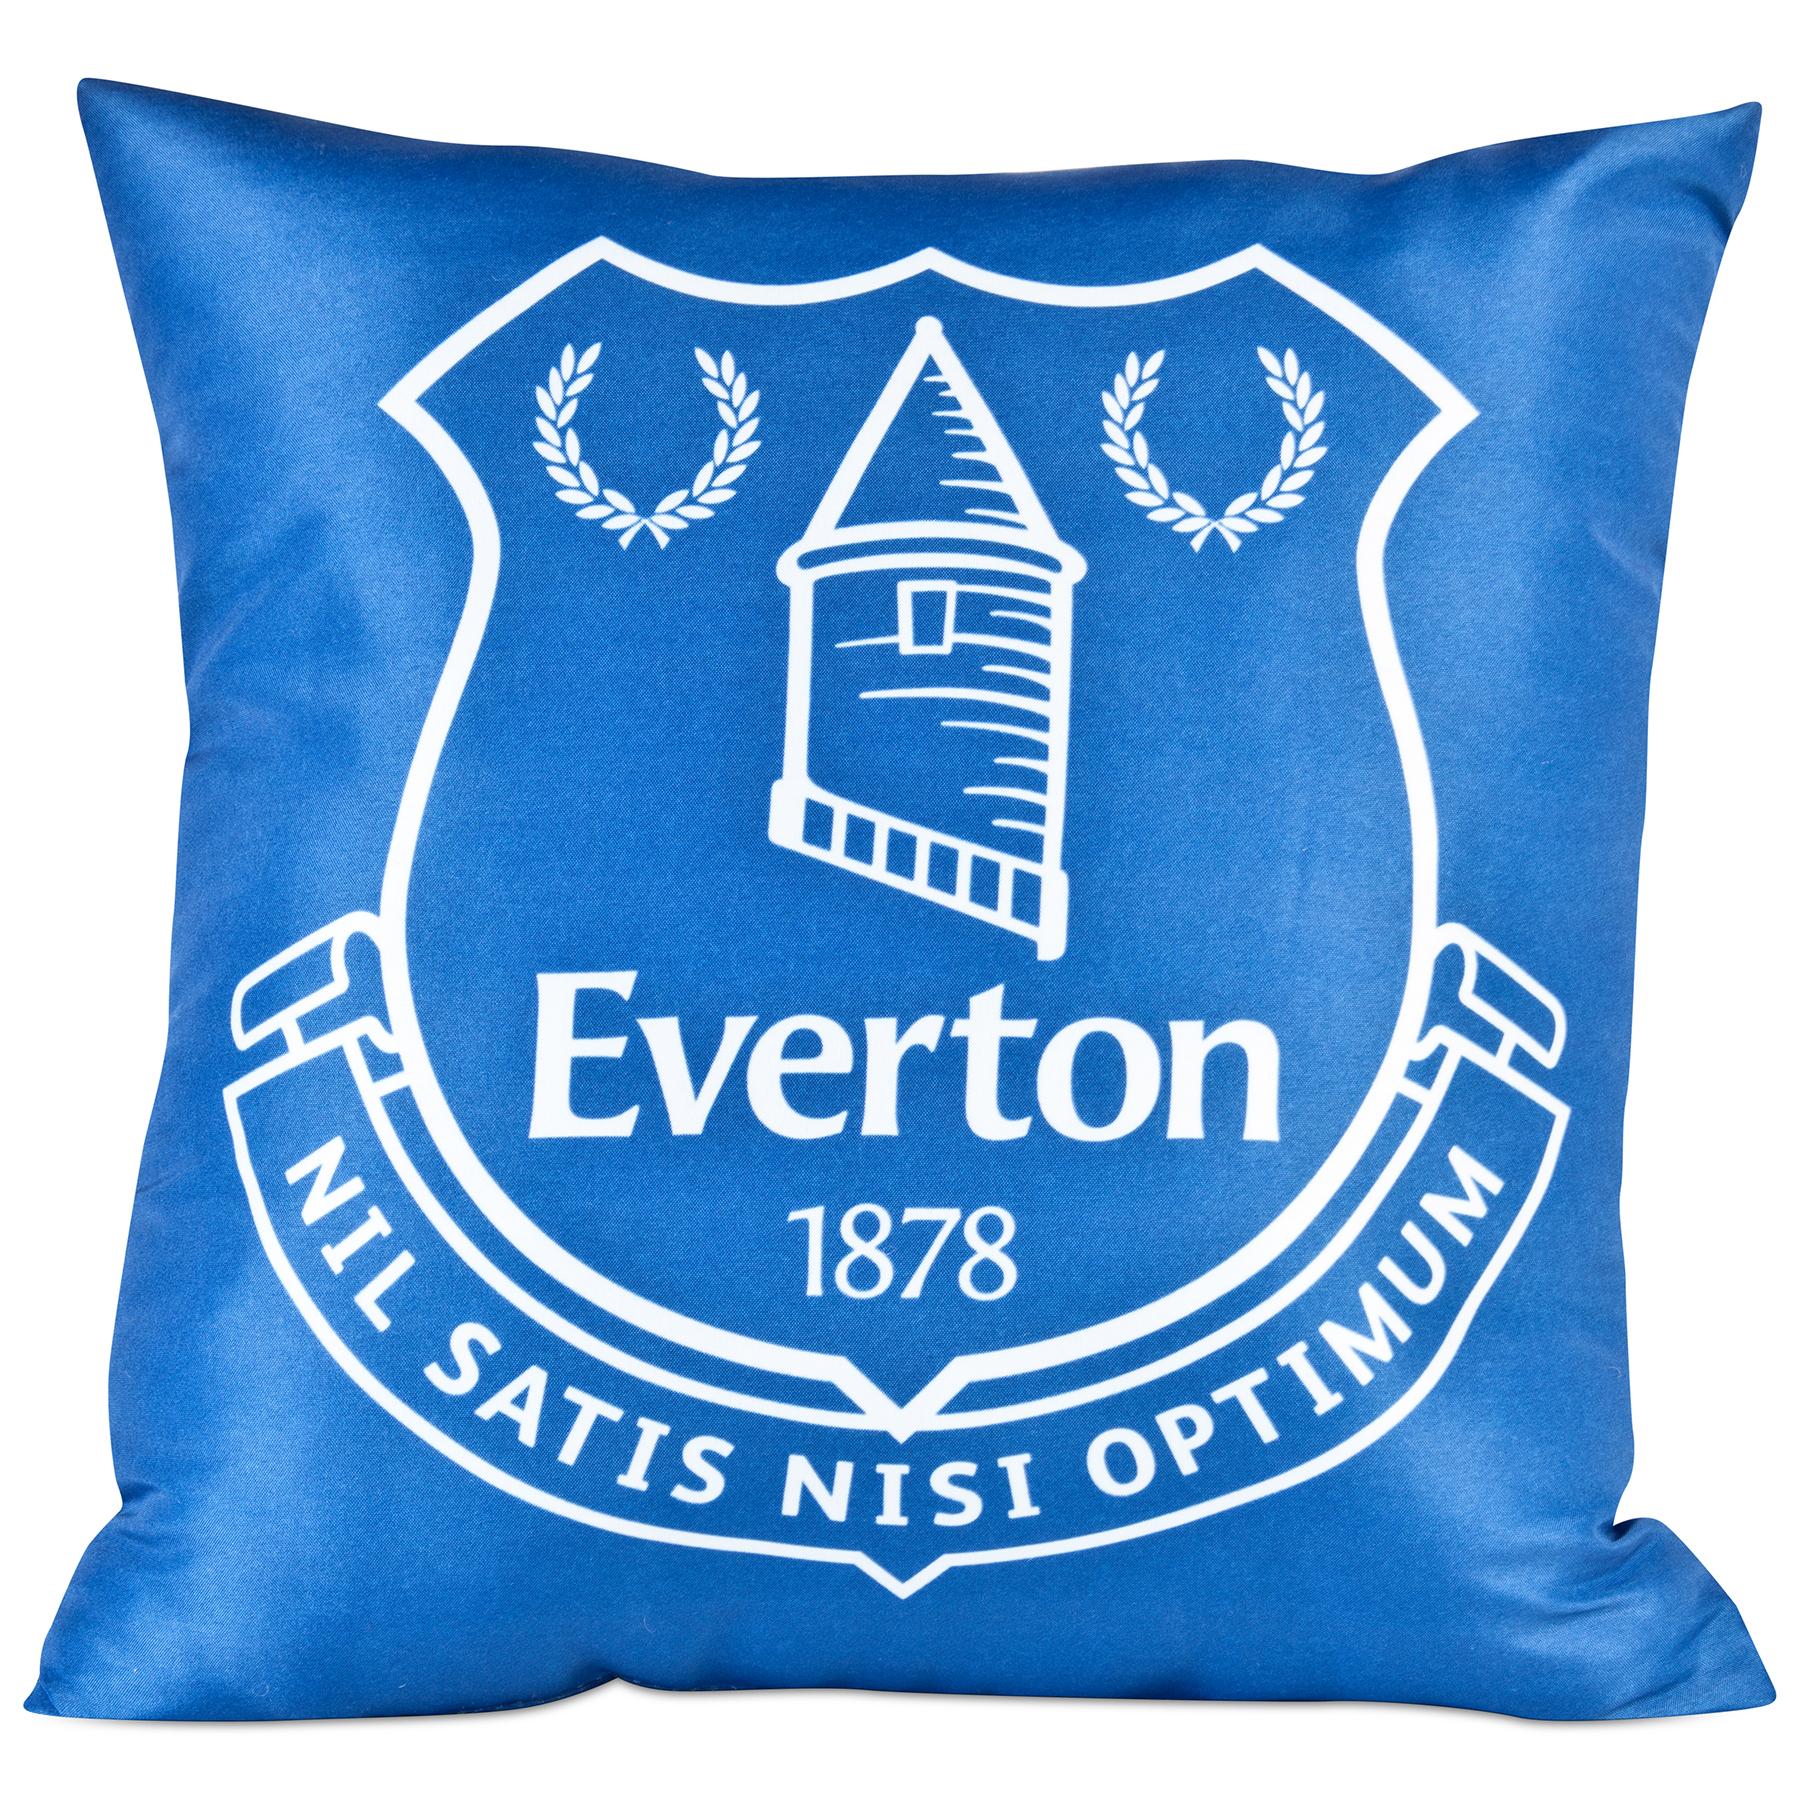 Everton Crest Cushion 35cm